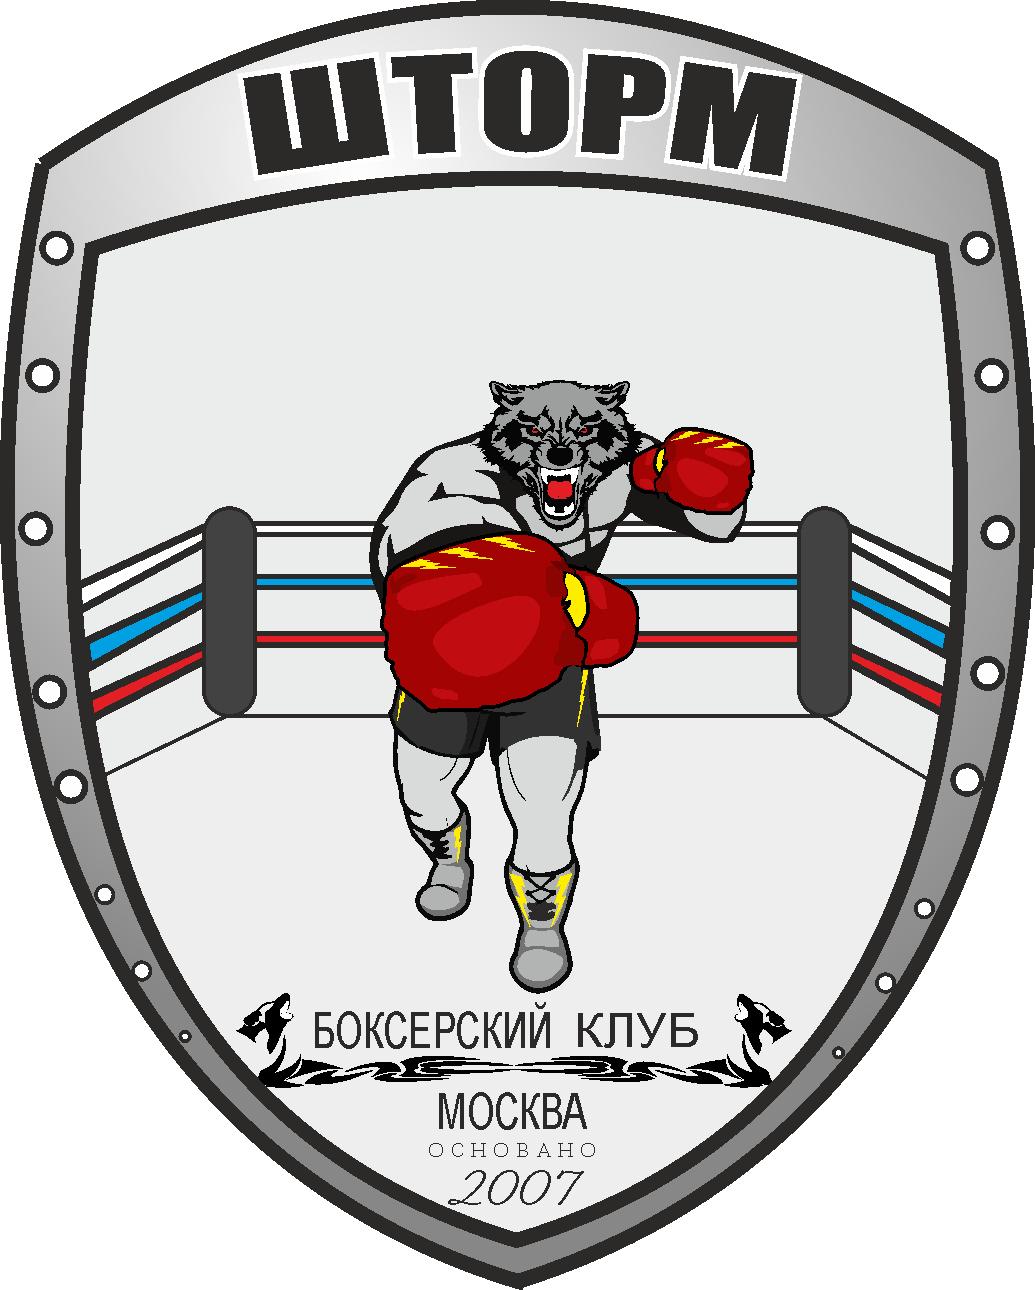 Клуб шторм москва носорог сургут мужской клуб